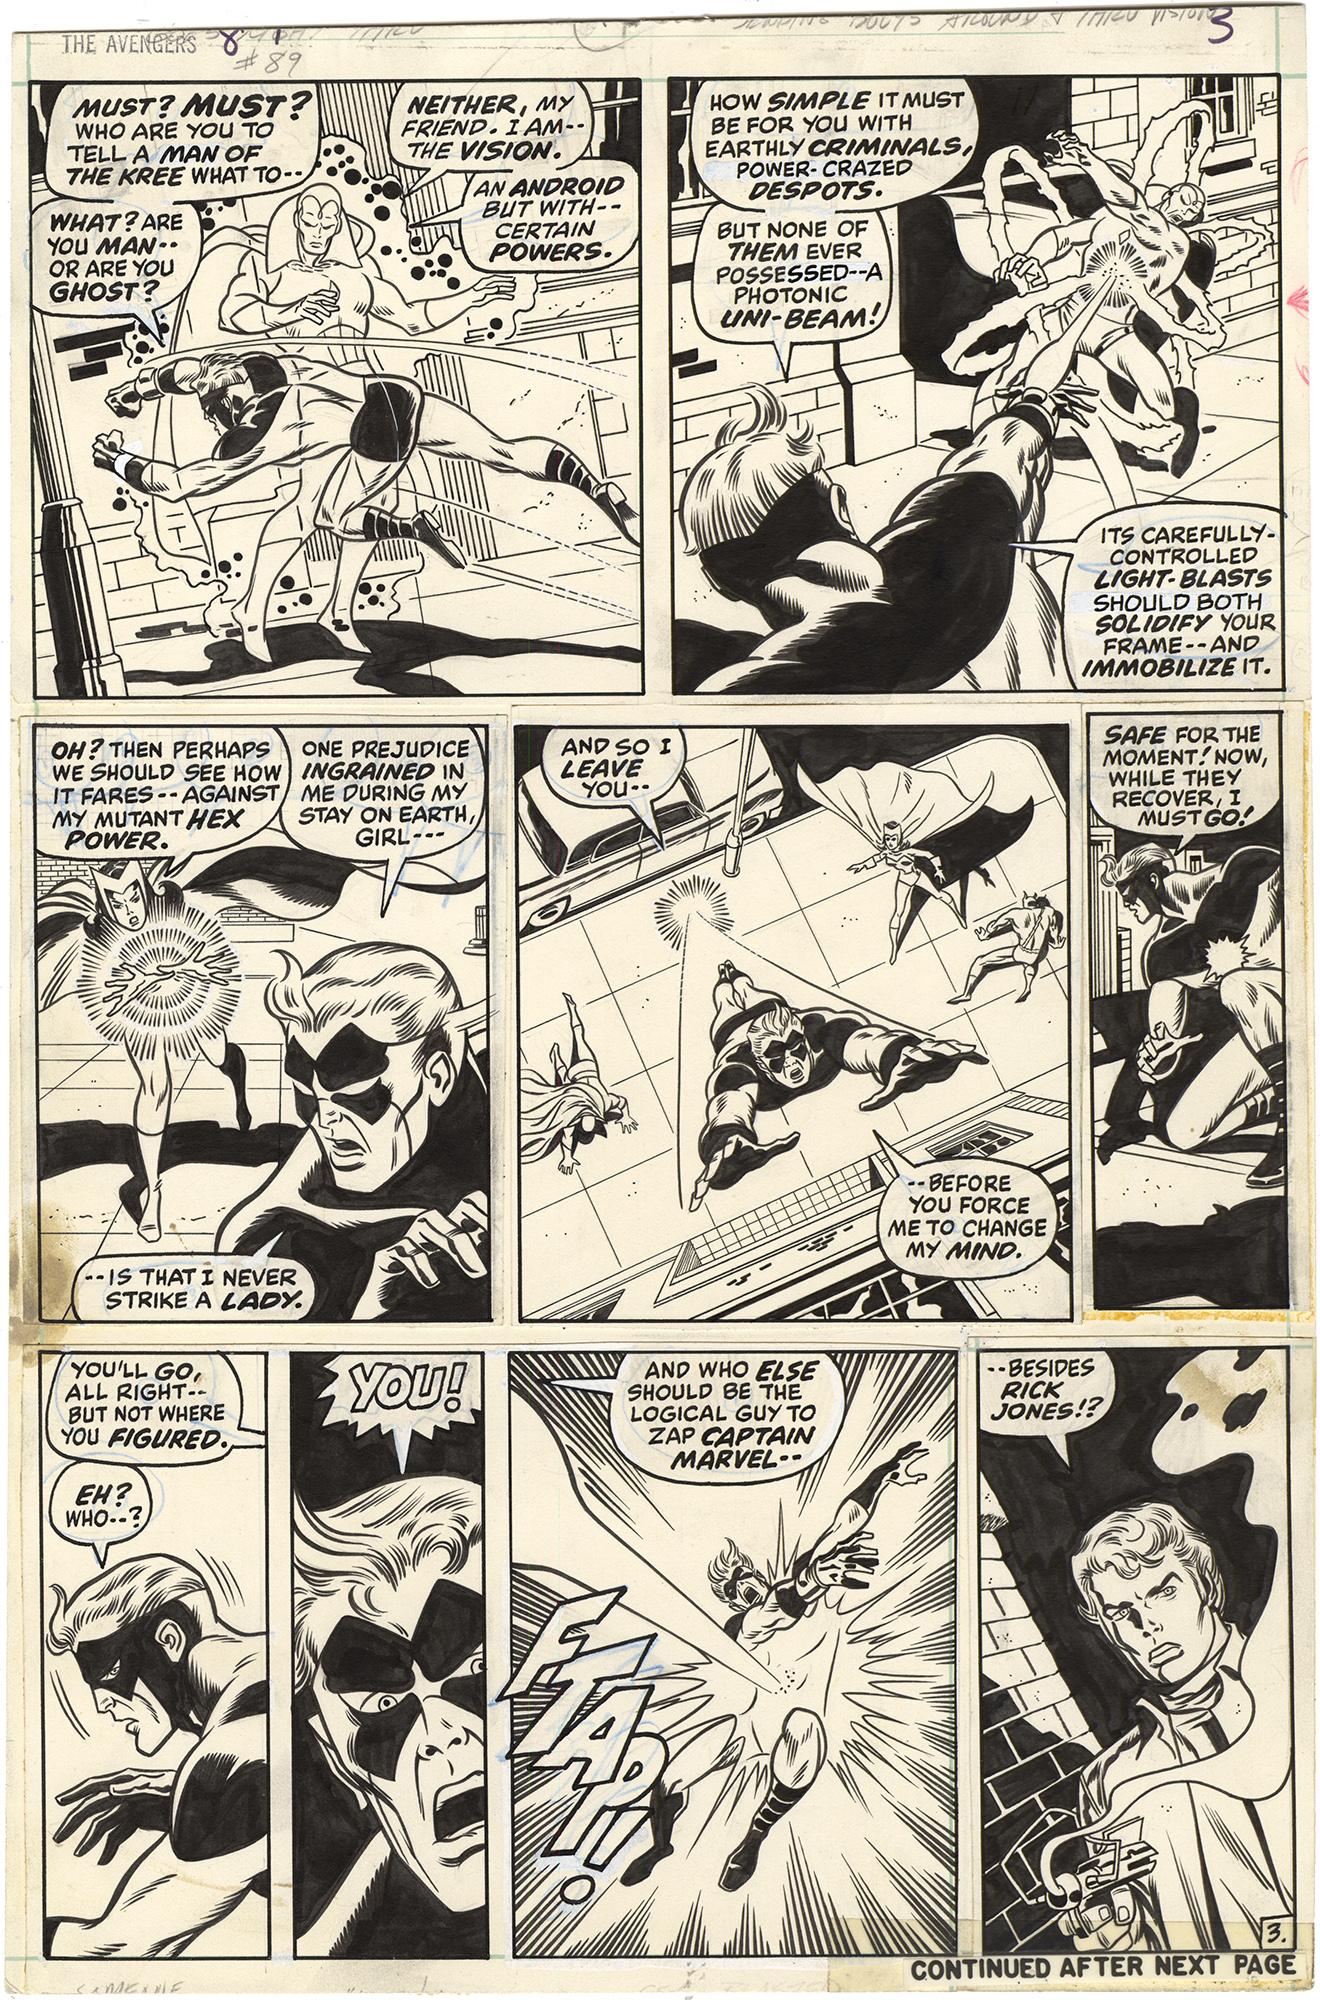 Avengers #89 p3